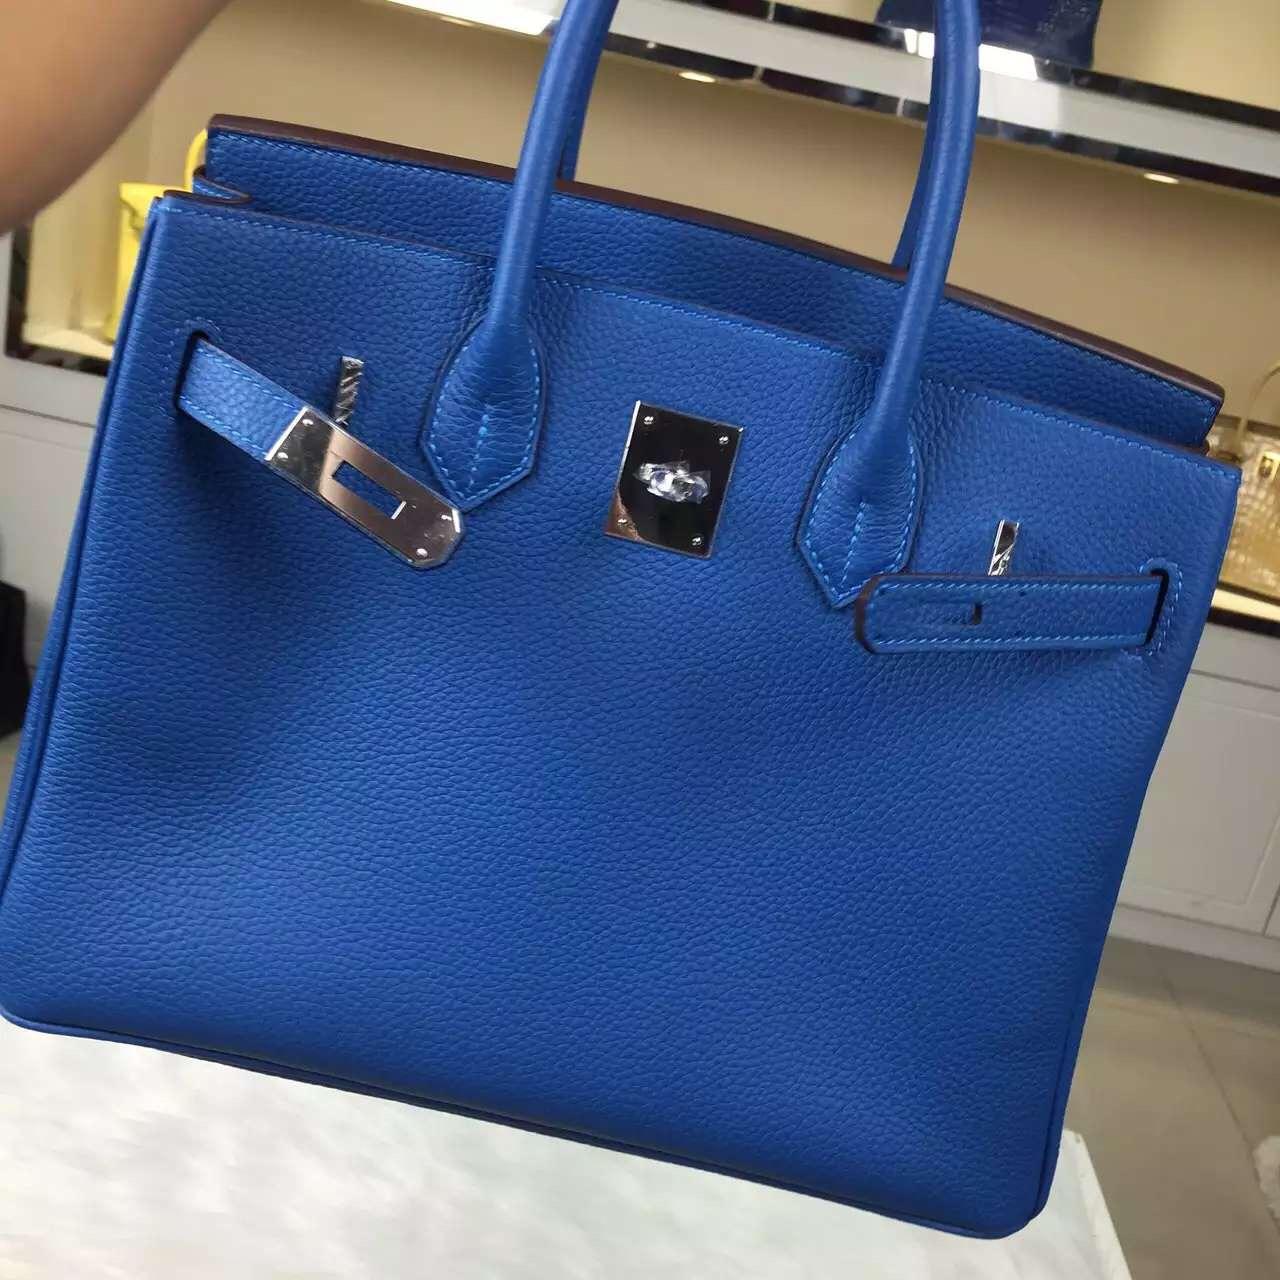 High Quality Hermes Original Togo Leather Birkin Bag in 7Q Mykono Blue 30CM